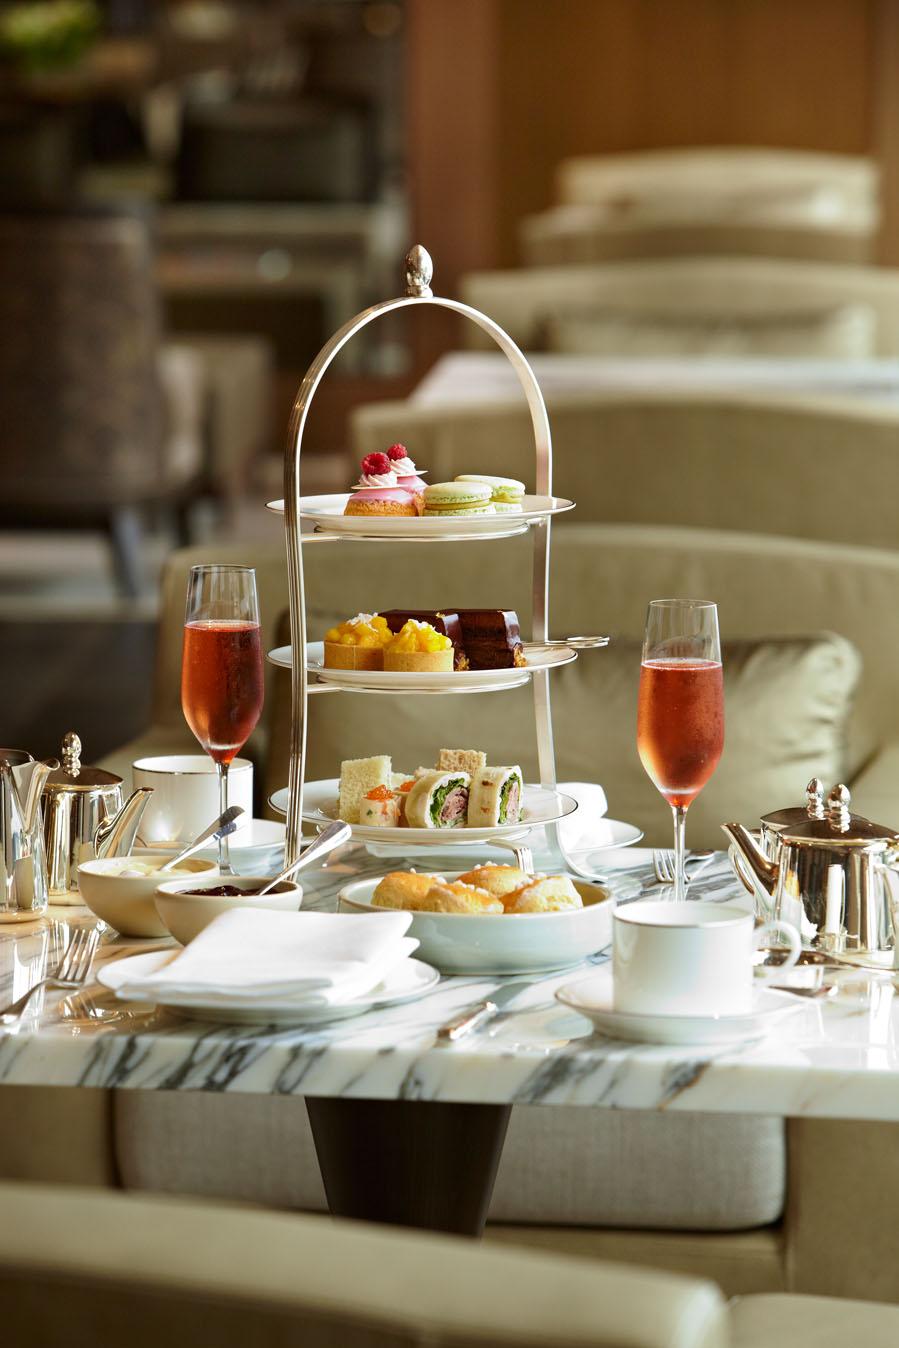 Bride To Be Magazine Blog Spa Afternoon Tea Offer From Park Hyatt Sydney